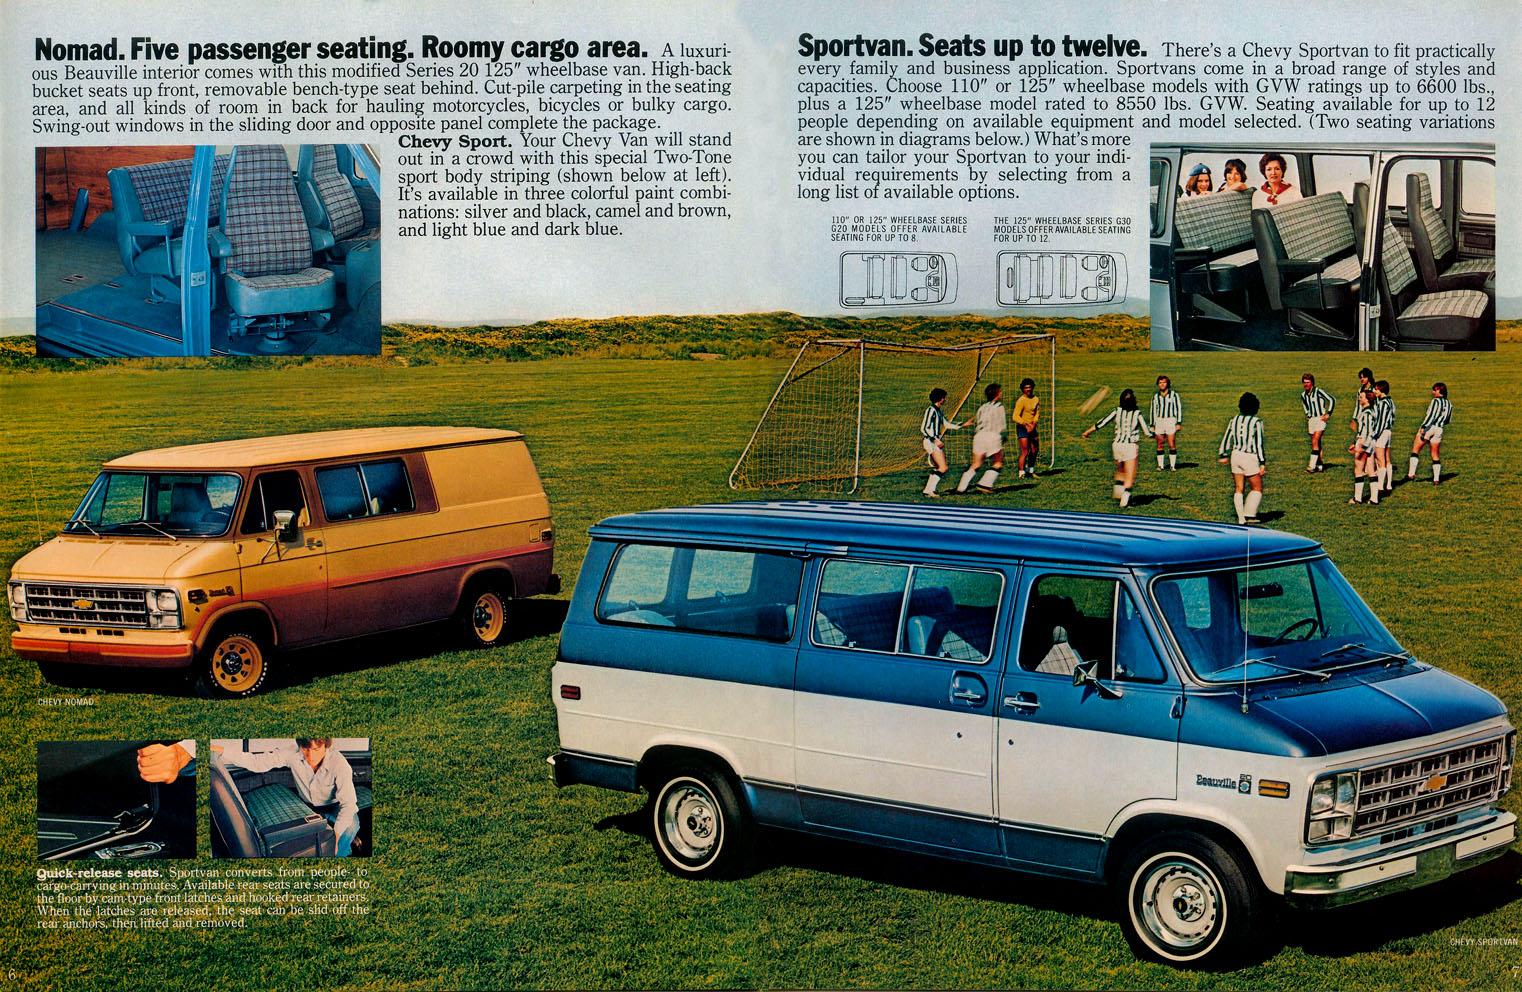 1979 Nomad & Sportvan | Vannin' | Pinterest